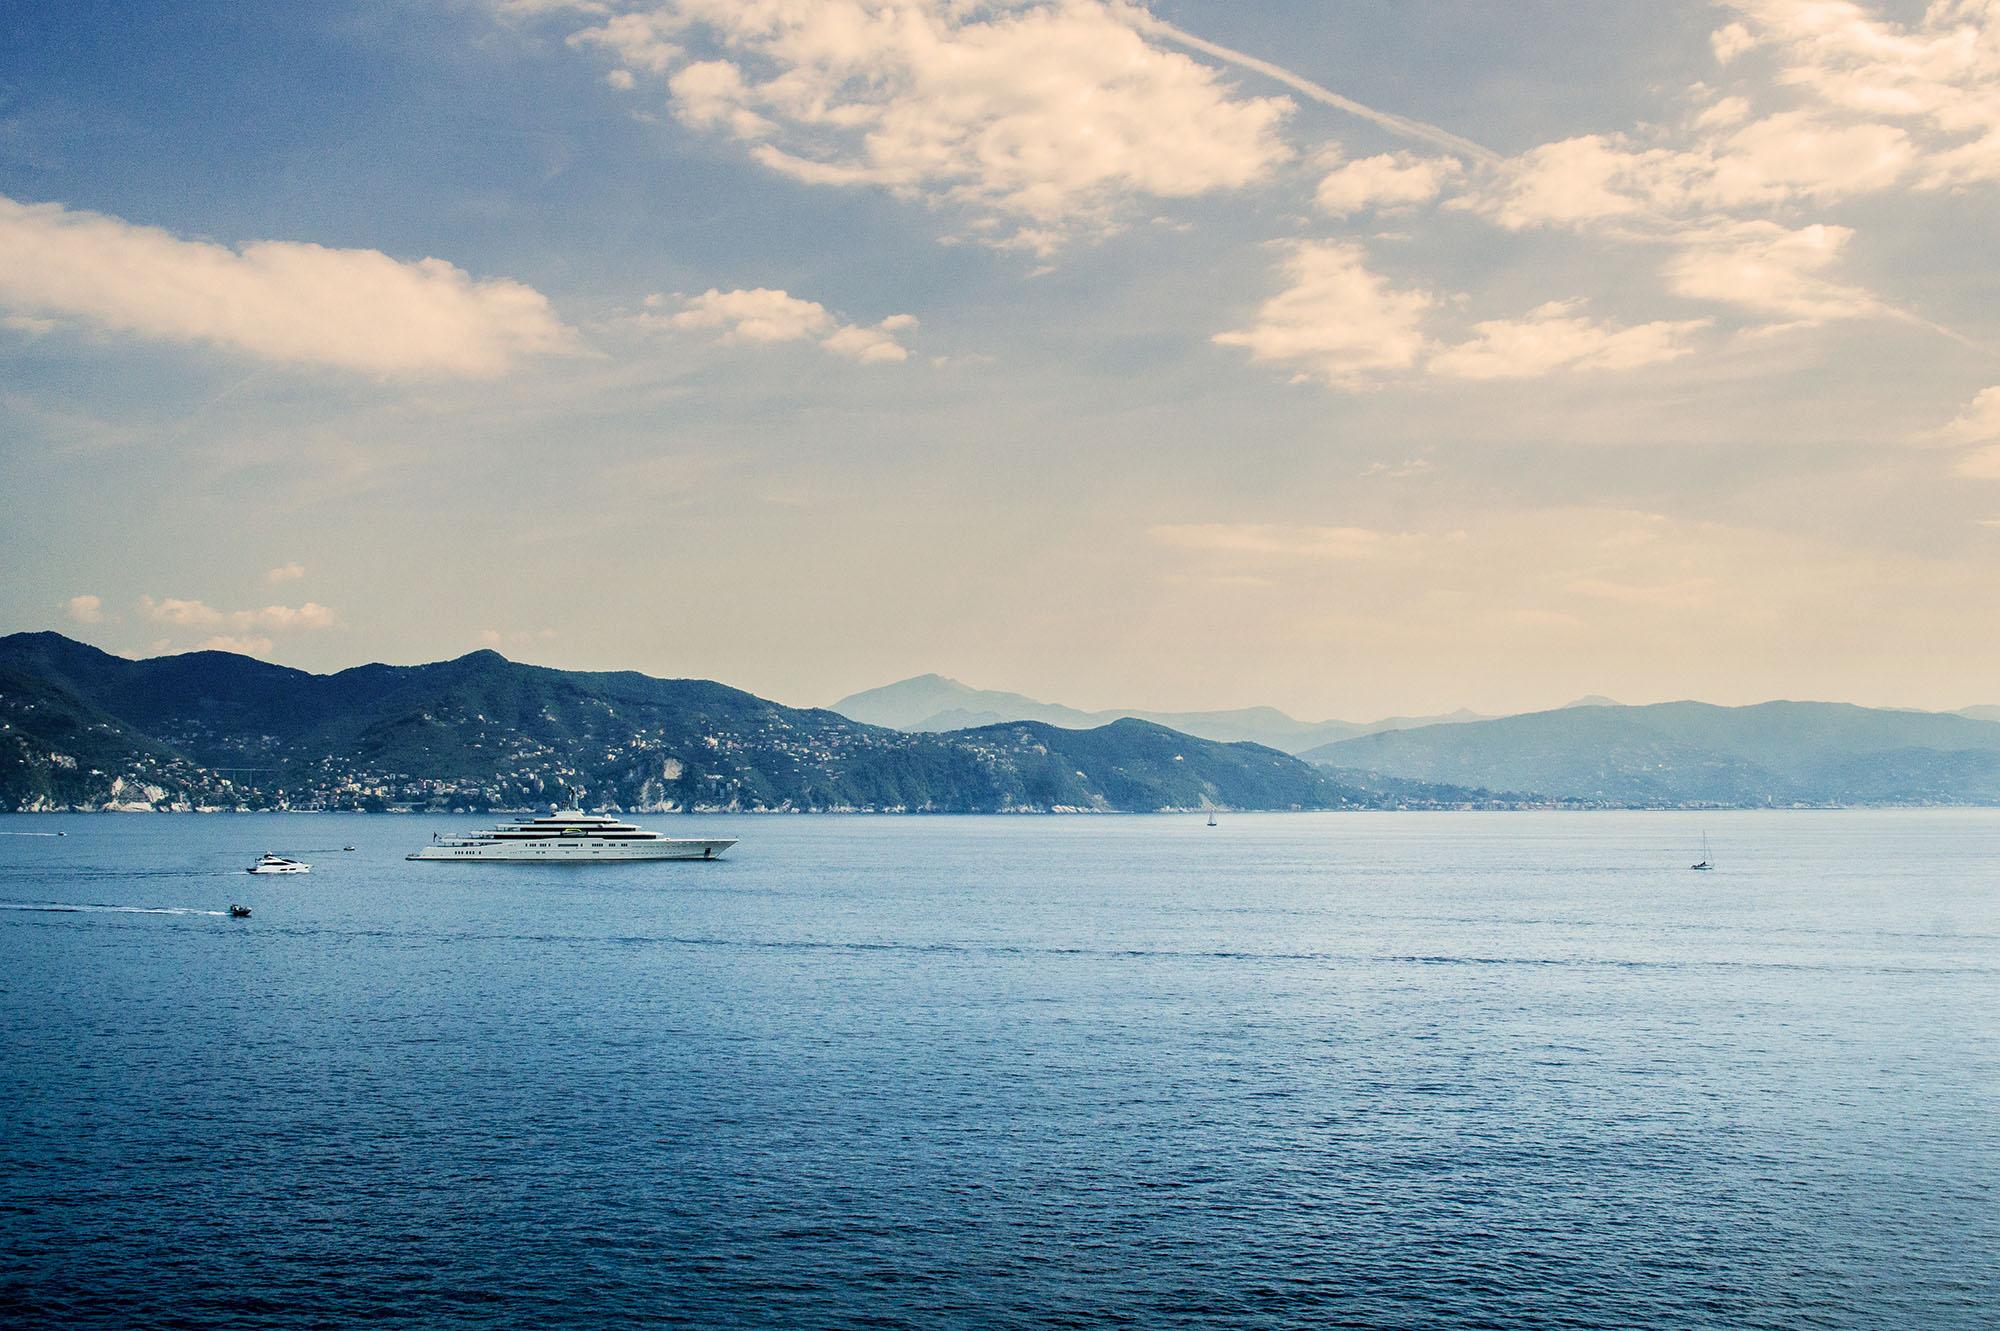 Portofino, Liguria